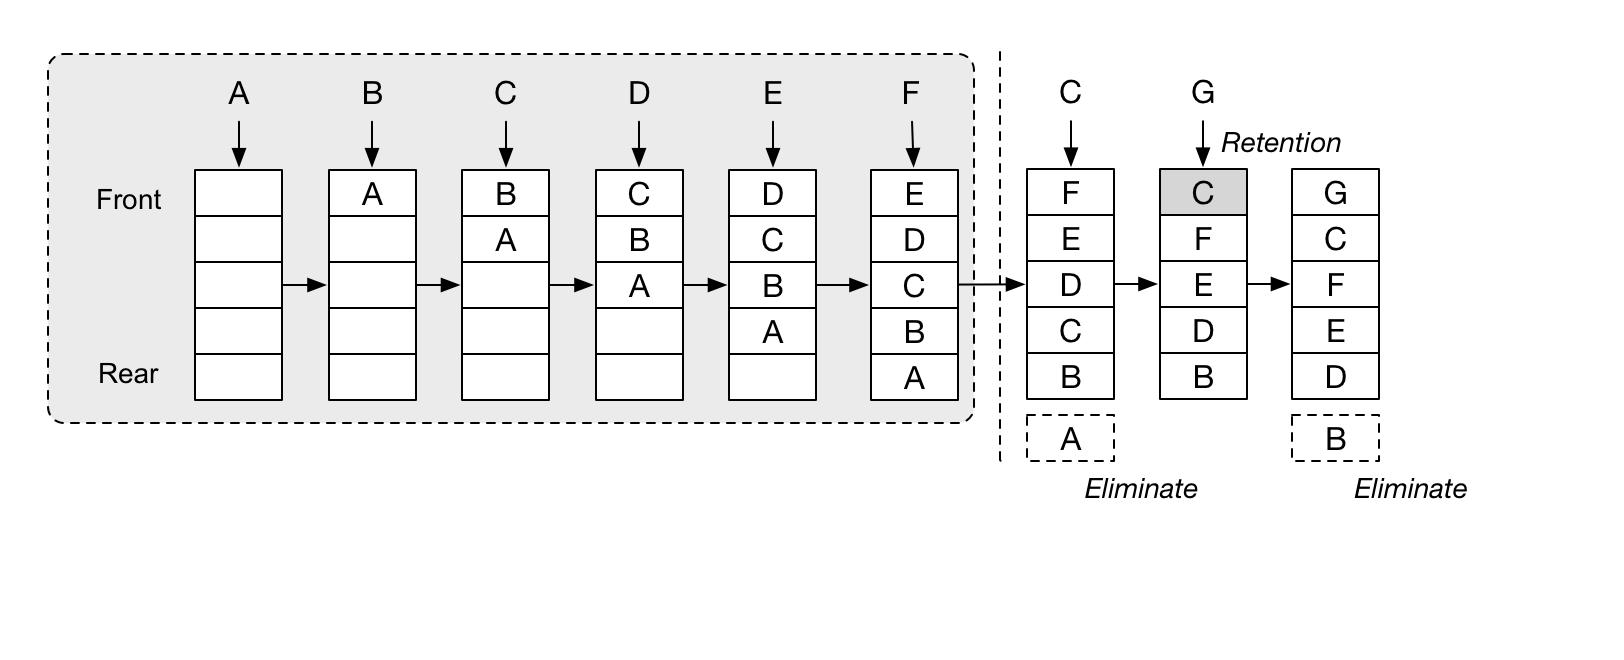 LRU Cache Elimination Process